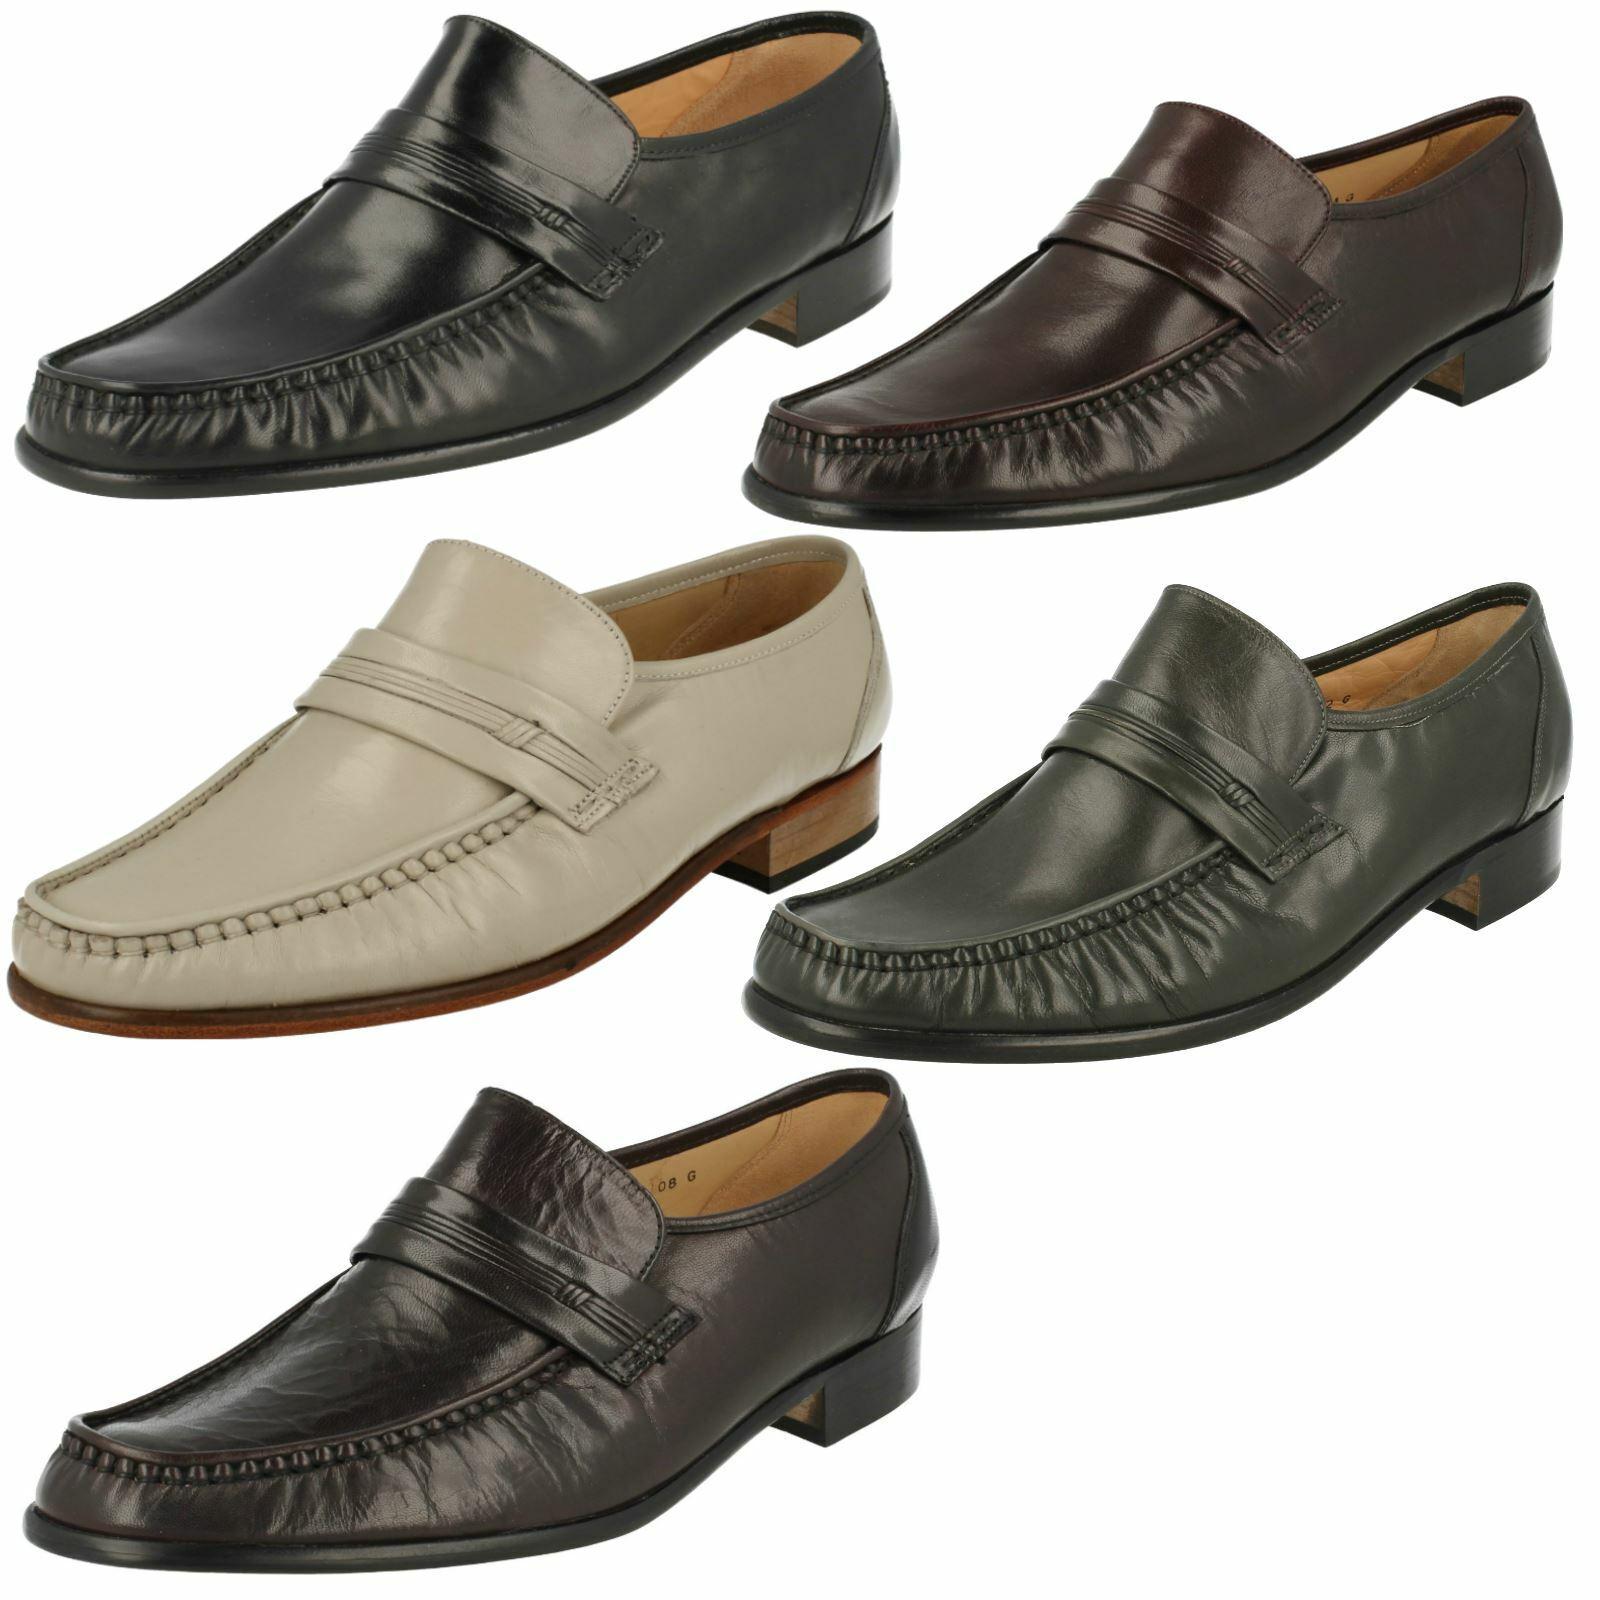 Homme Grenson  Formelle Mocassin Chaussures-Clapham